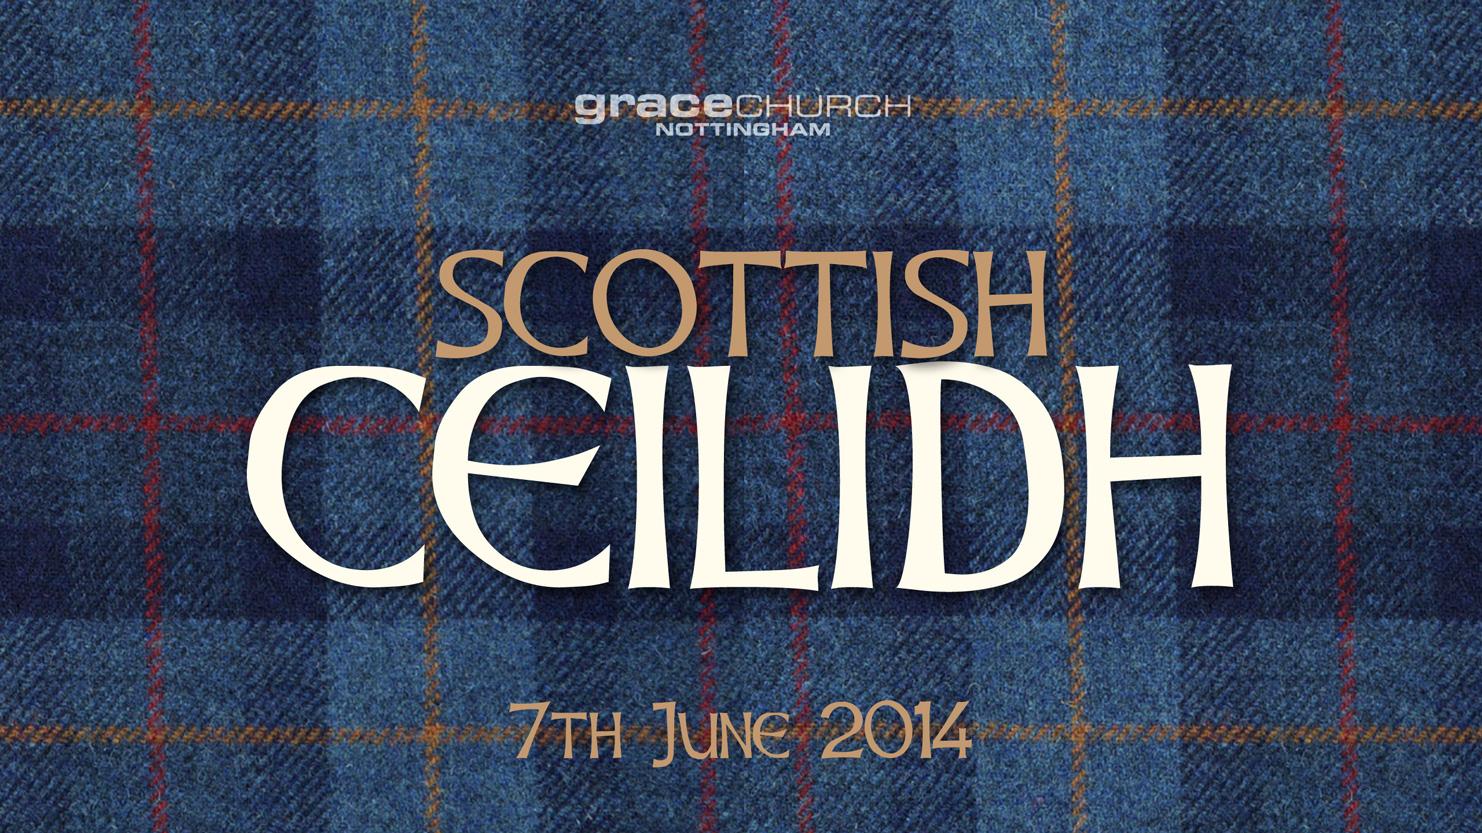 Ceilidh-Scottish-Night-Graphic-1.jpg